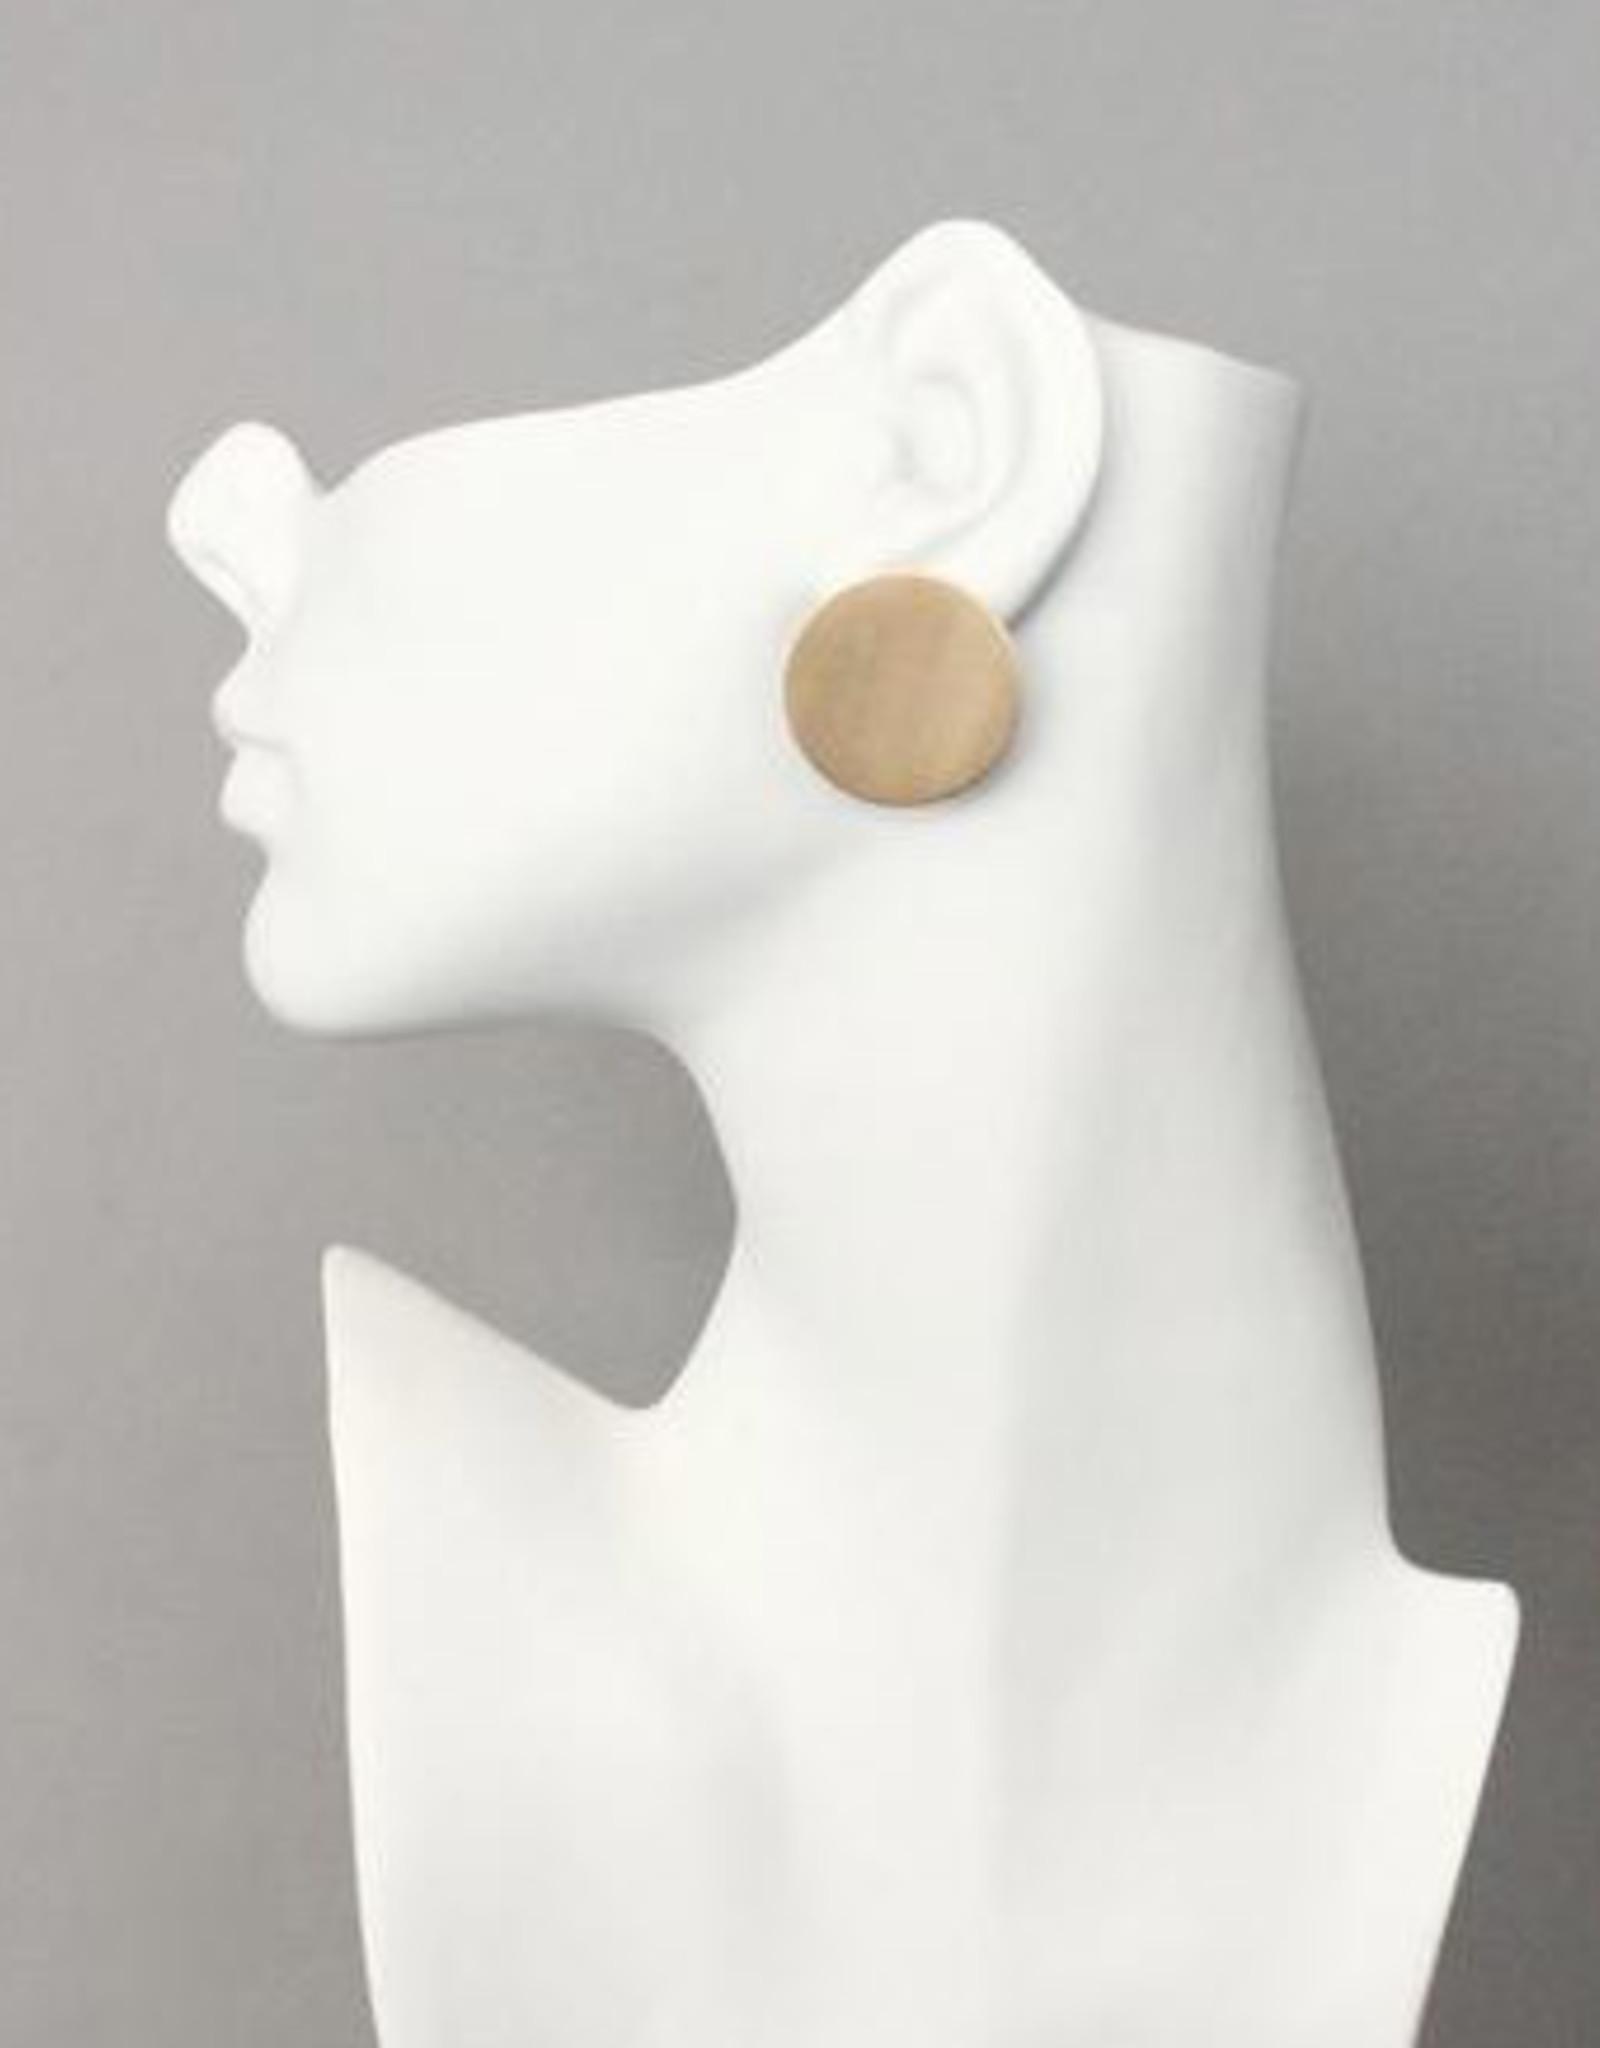 David Aubrey Brushed Brass Circle Post Earrings - David Aubrey